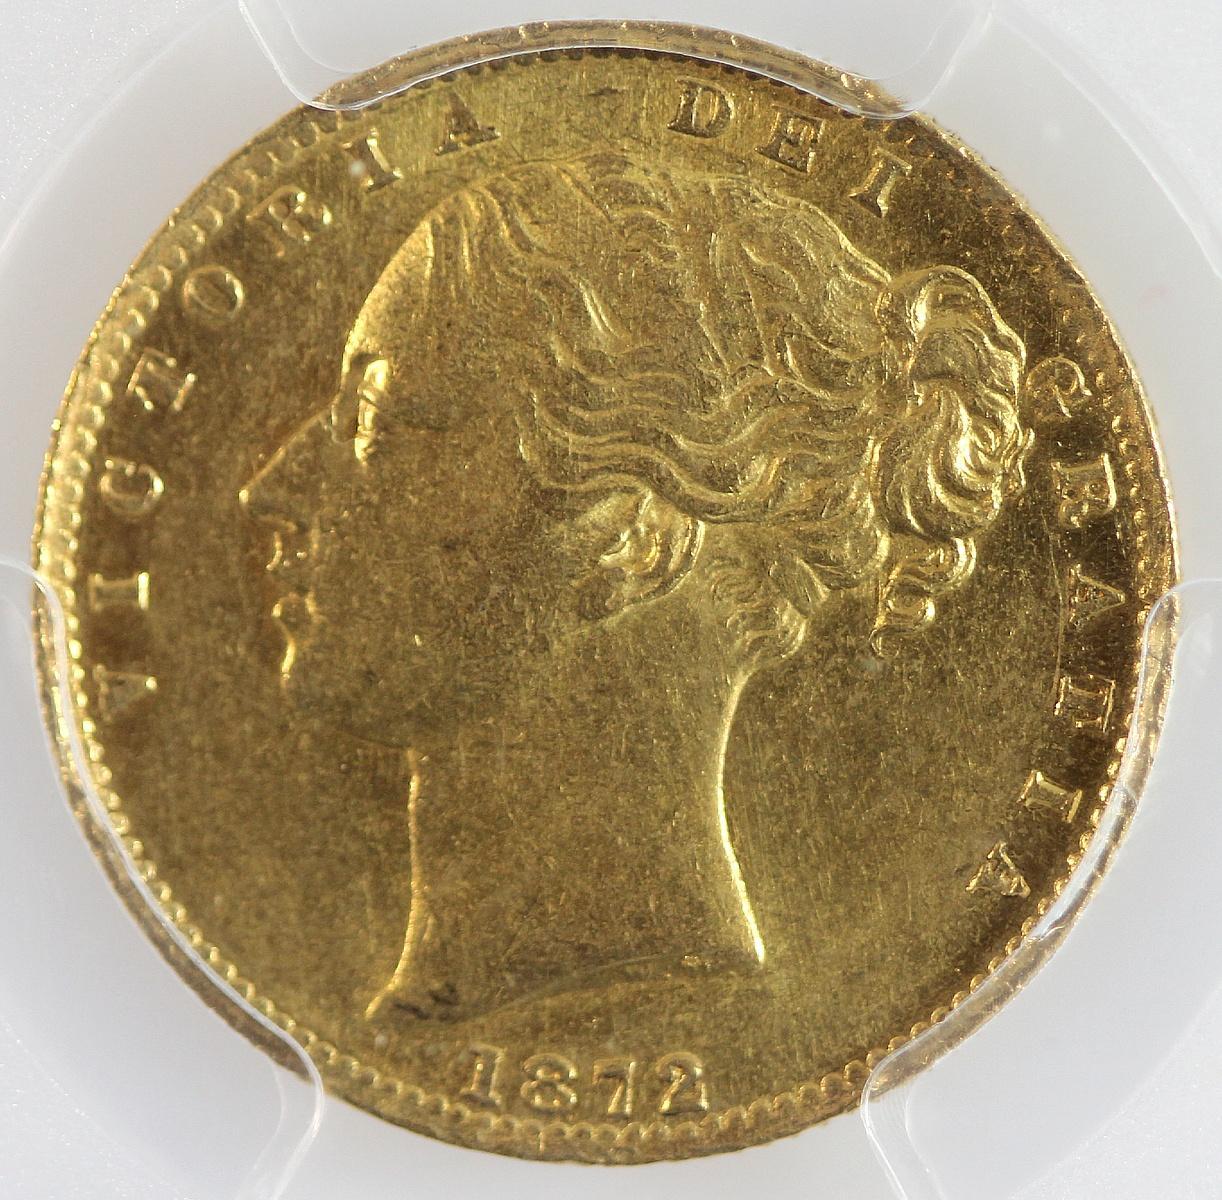 Australia. 1872 M 'Coin Alignment' Gold (0.916) Sovereign, PCGS AU58